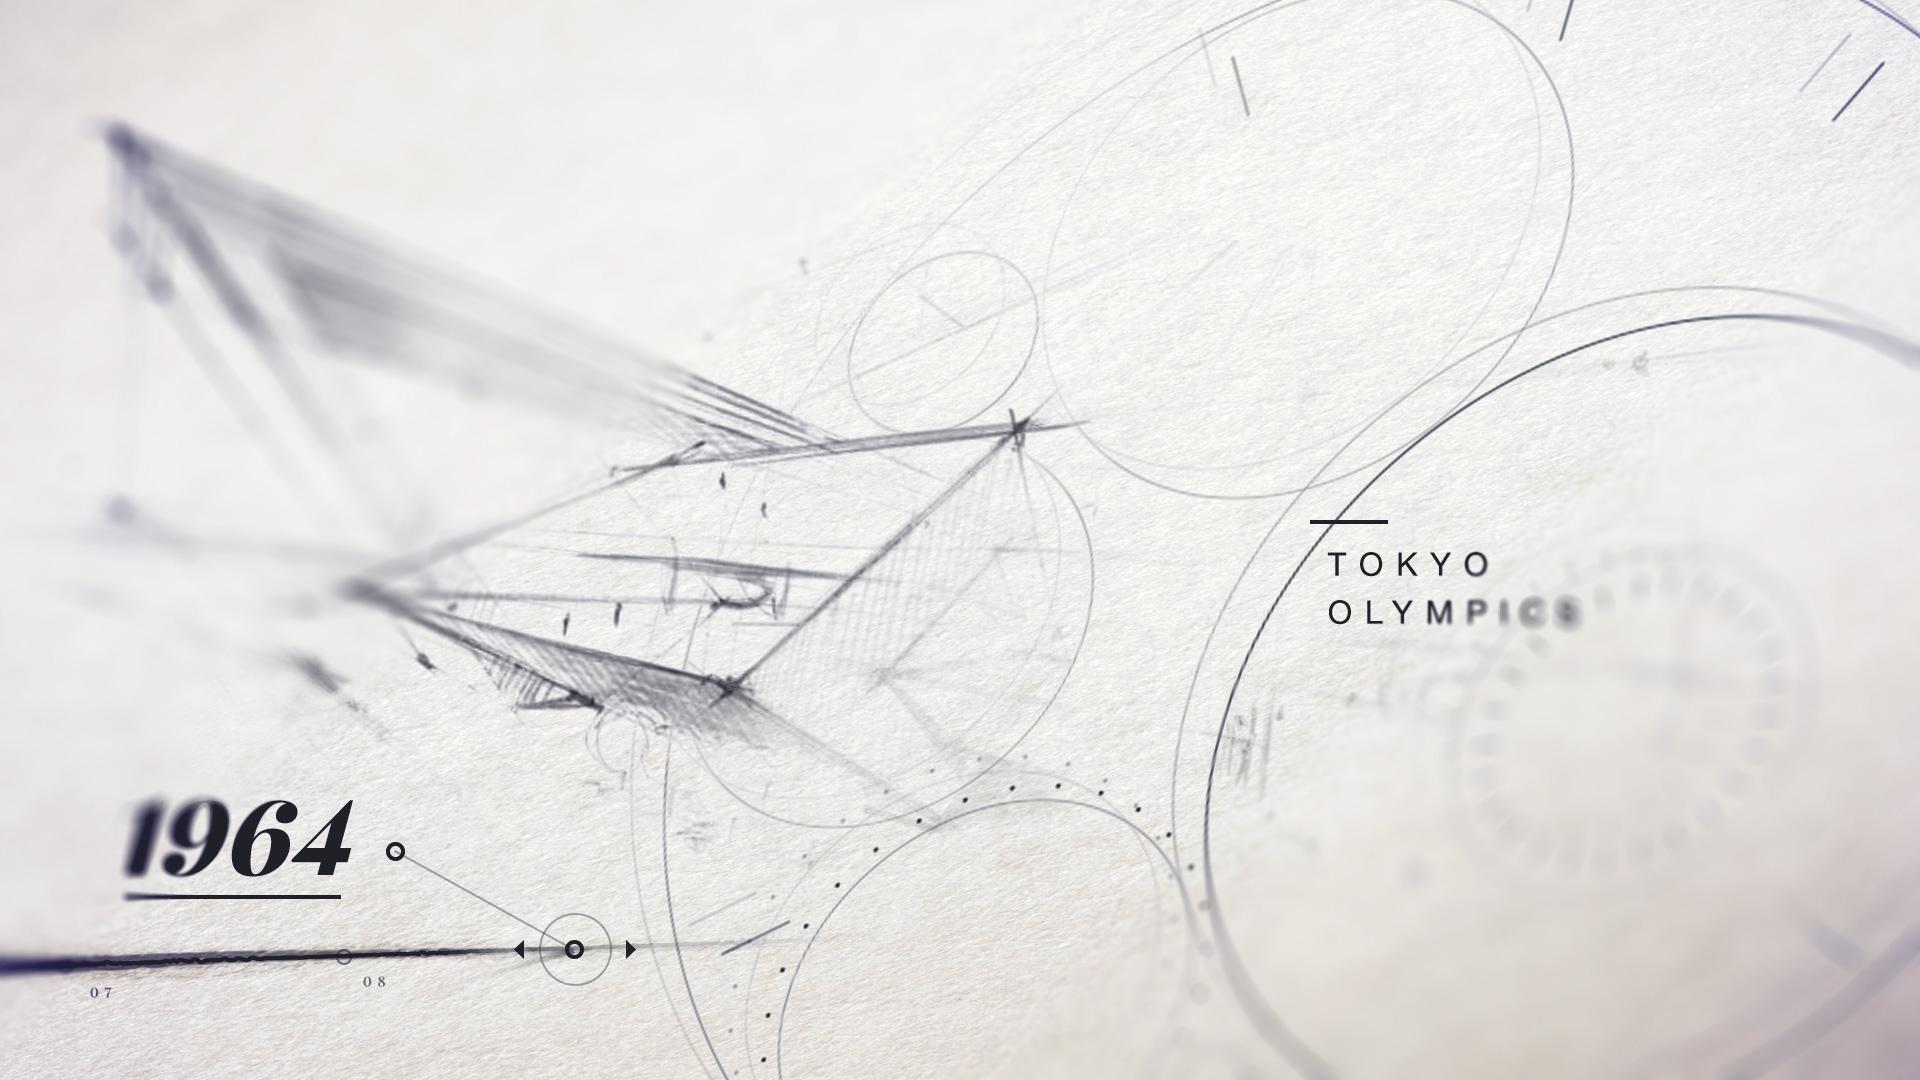 epson-corpo-sketch-02-02.jpg